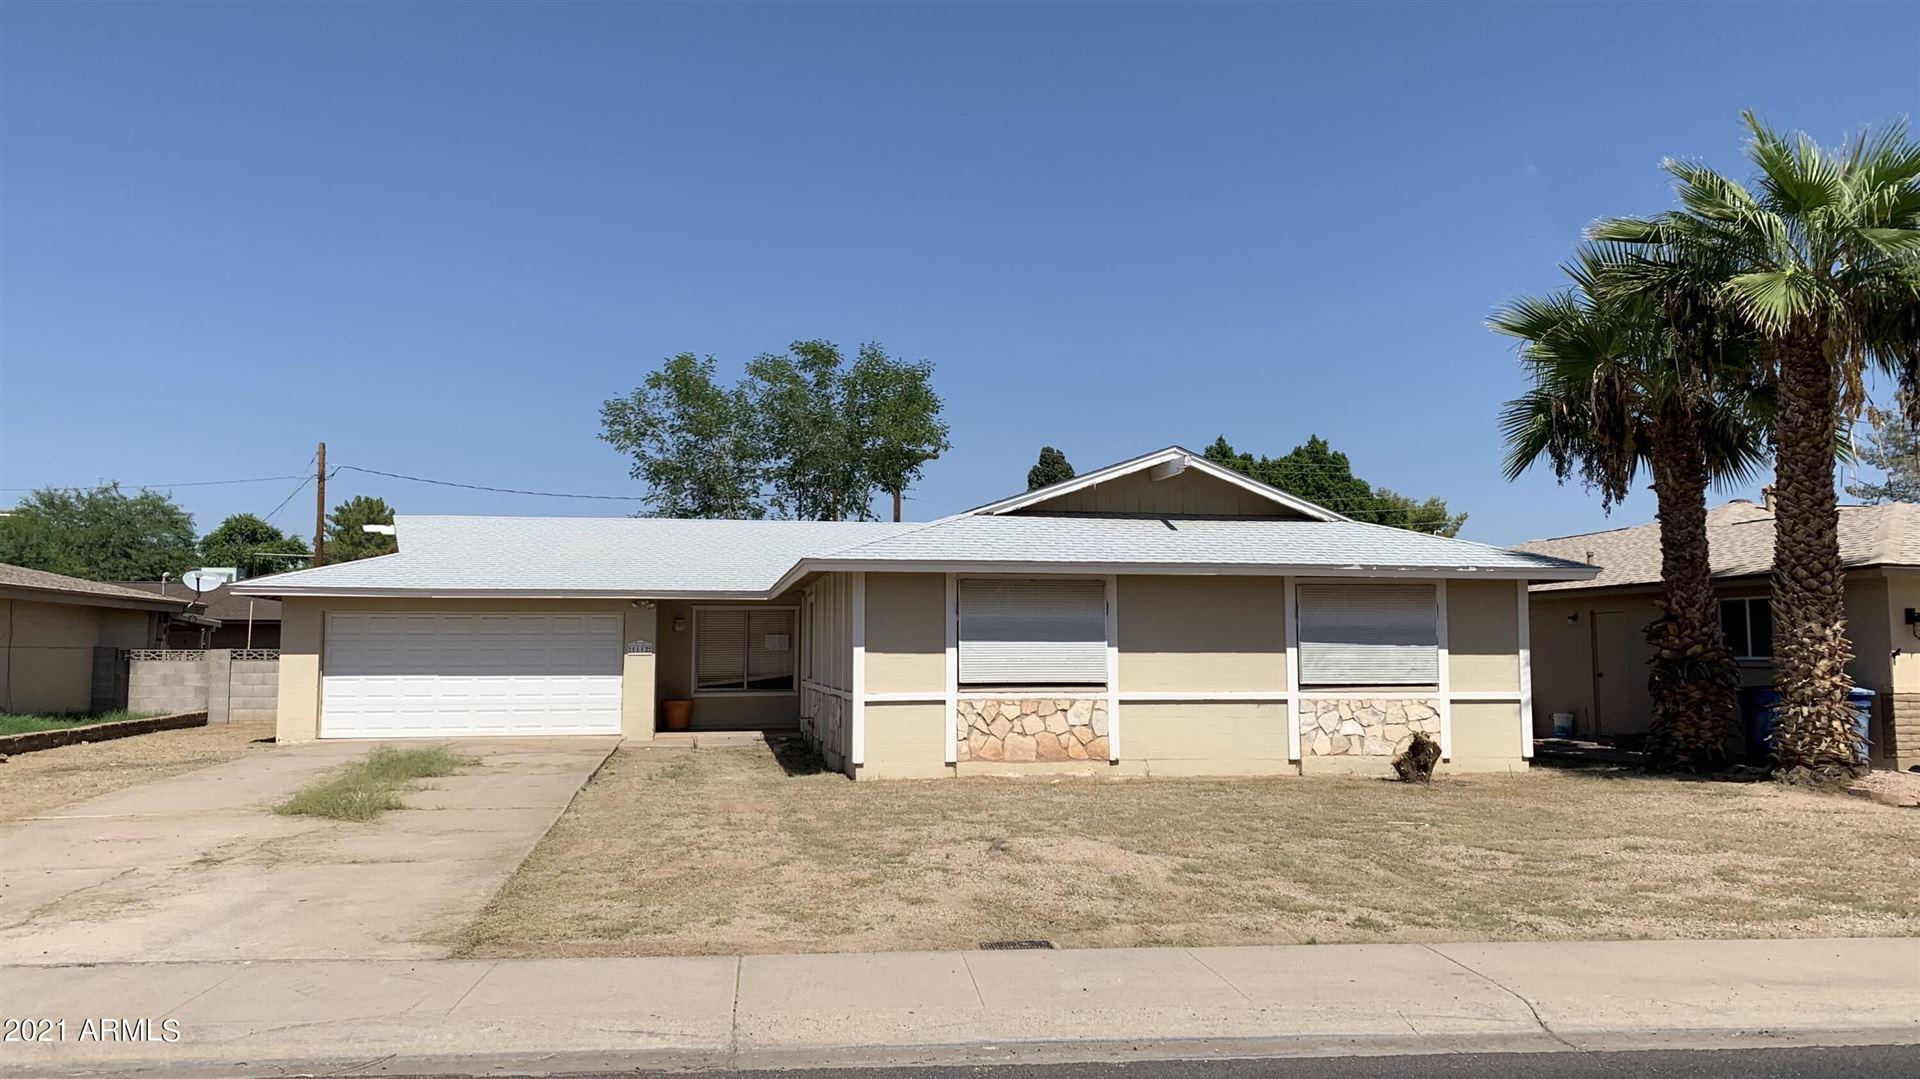 1112 E Manhatton Drive, Tempe, AZ 85282 - MLS#: 6297728